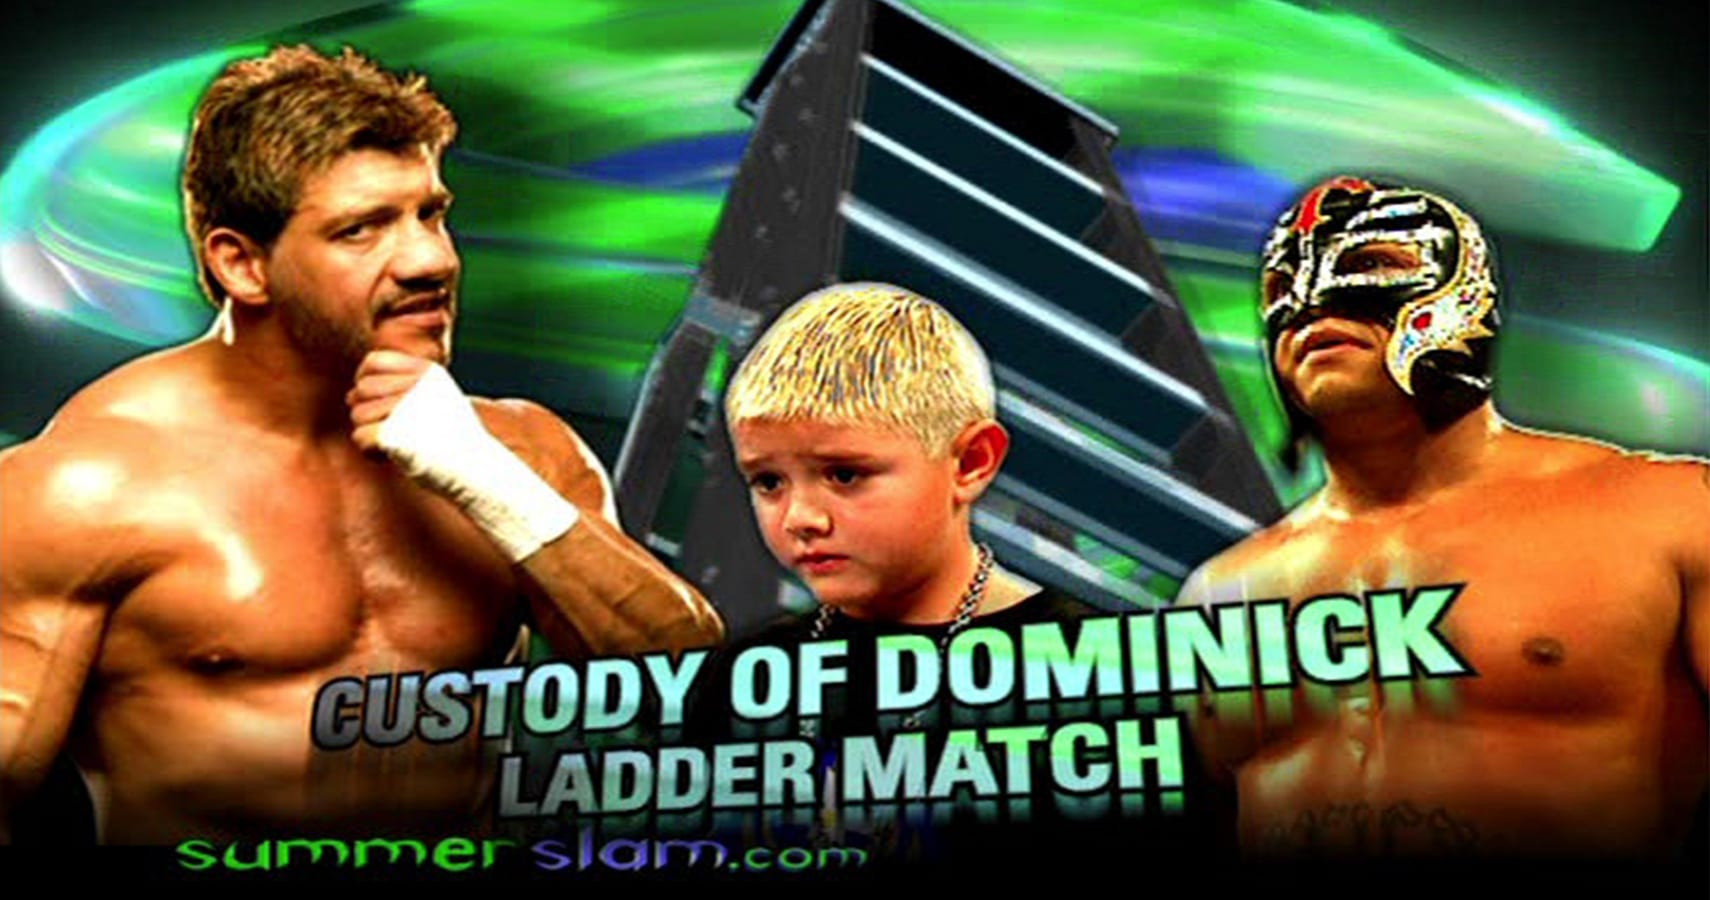 Eddie Guerrero vs. Rey Mysterio - SummerSlam 2005 (Ladder Match For Custody Of Dominic)